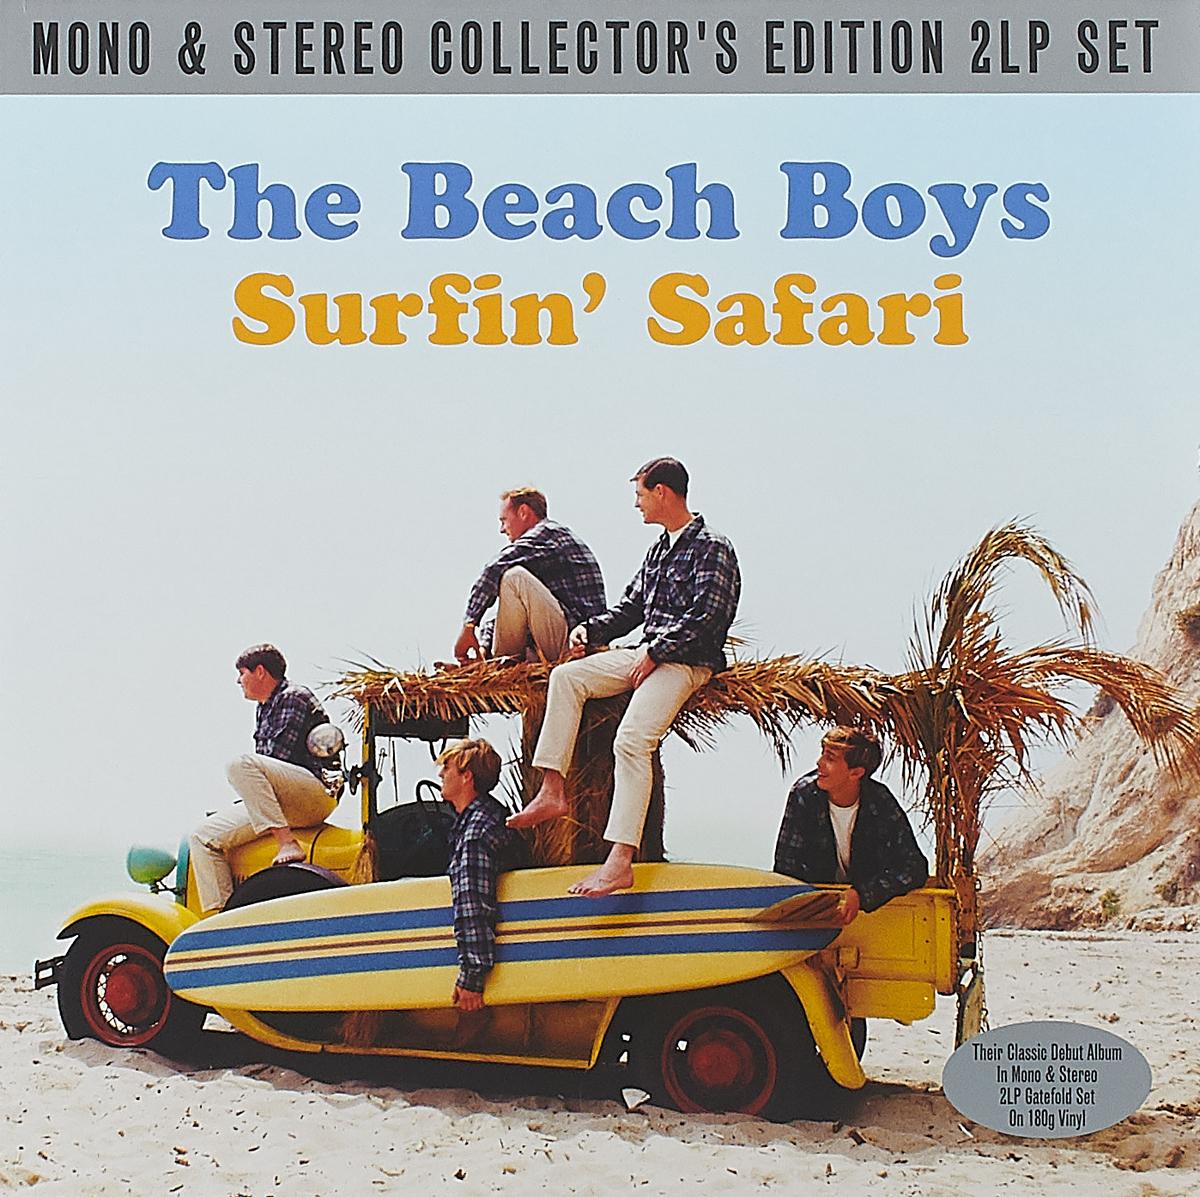 """The Beach Boys"" The Beach Boys. Surfin' Safari. Mono & Stereo (2 LP)"